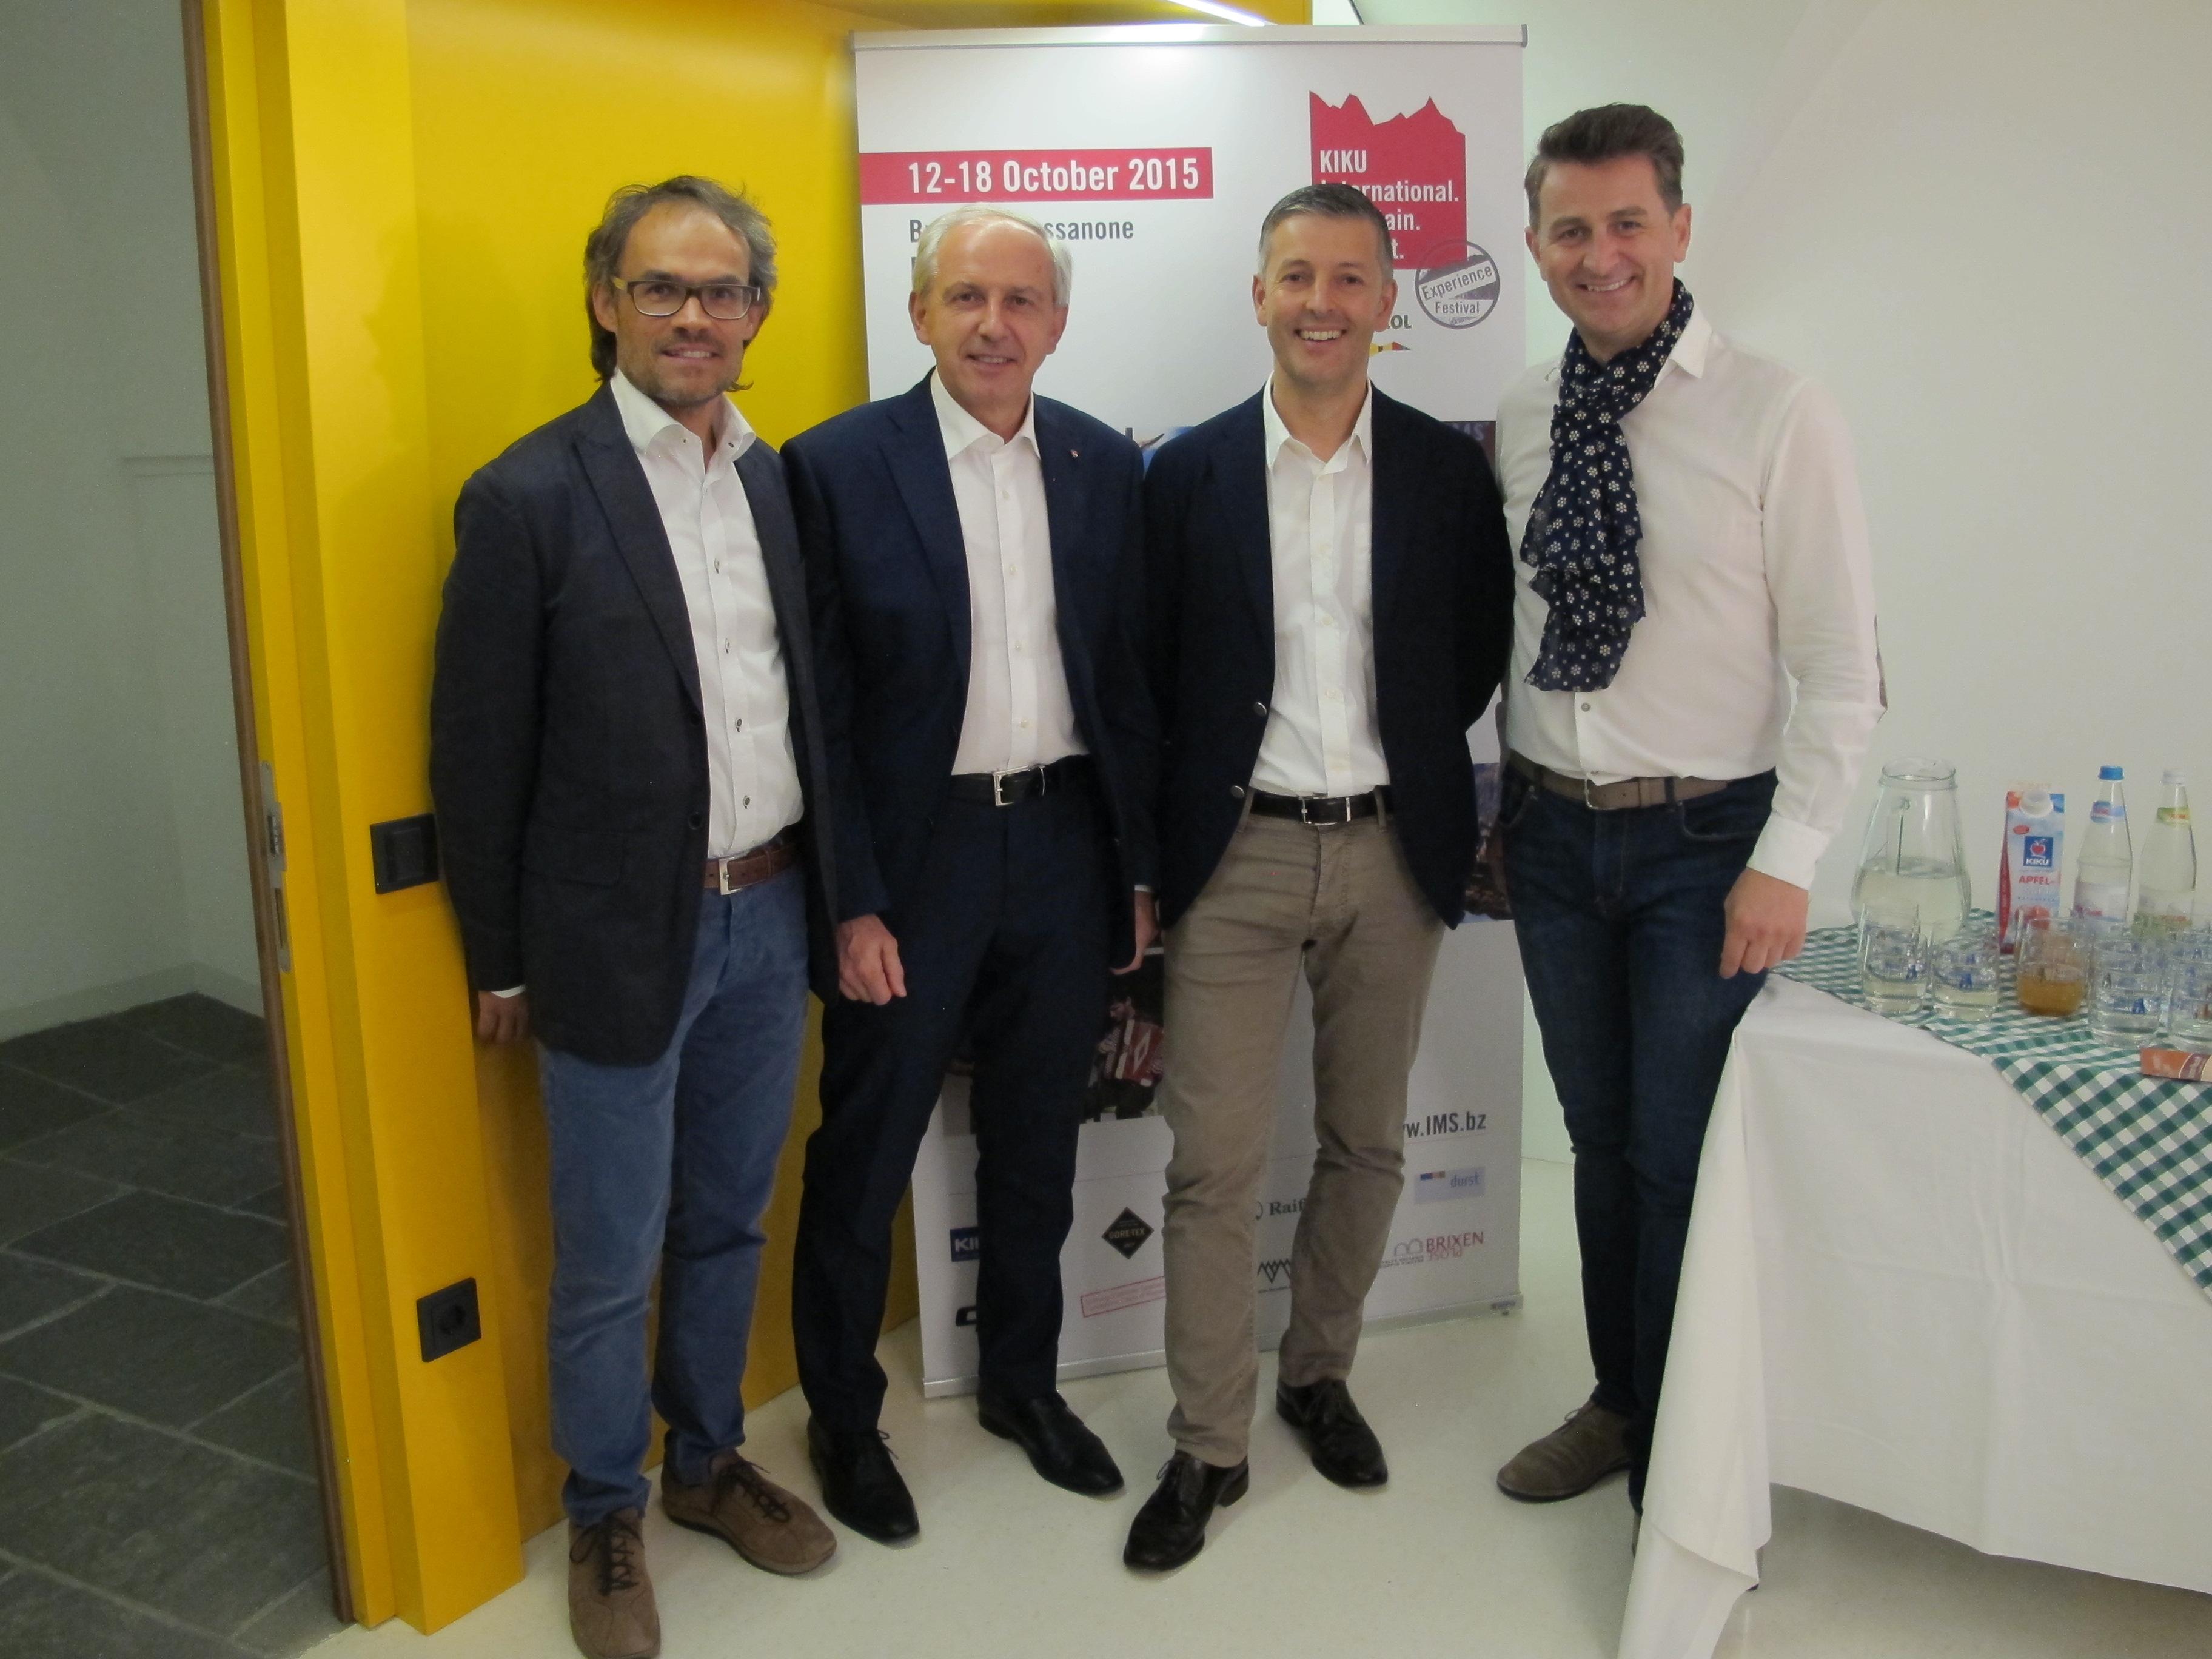 IMS Präsident Markus Gaiser, Vizebürgermeister (Brixen) Claudio Del Piero, Bürgermeister (Brixen) Peter Brunner, IMS Gründer Alex Ploner (c) IMS